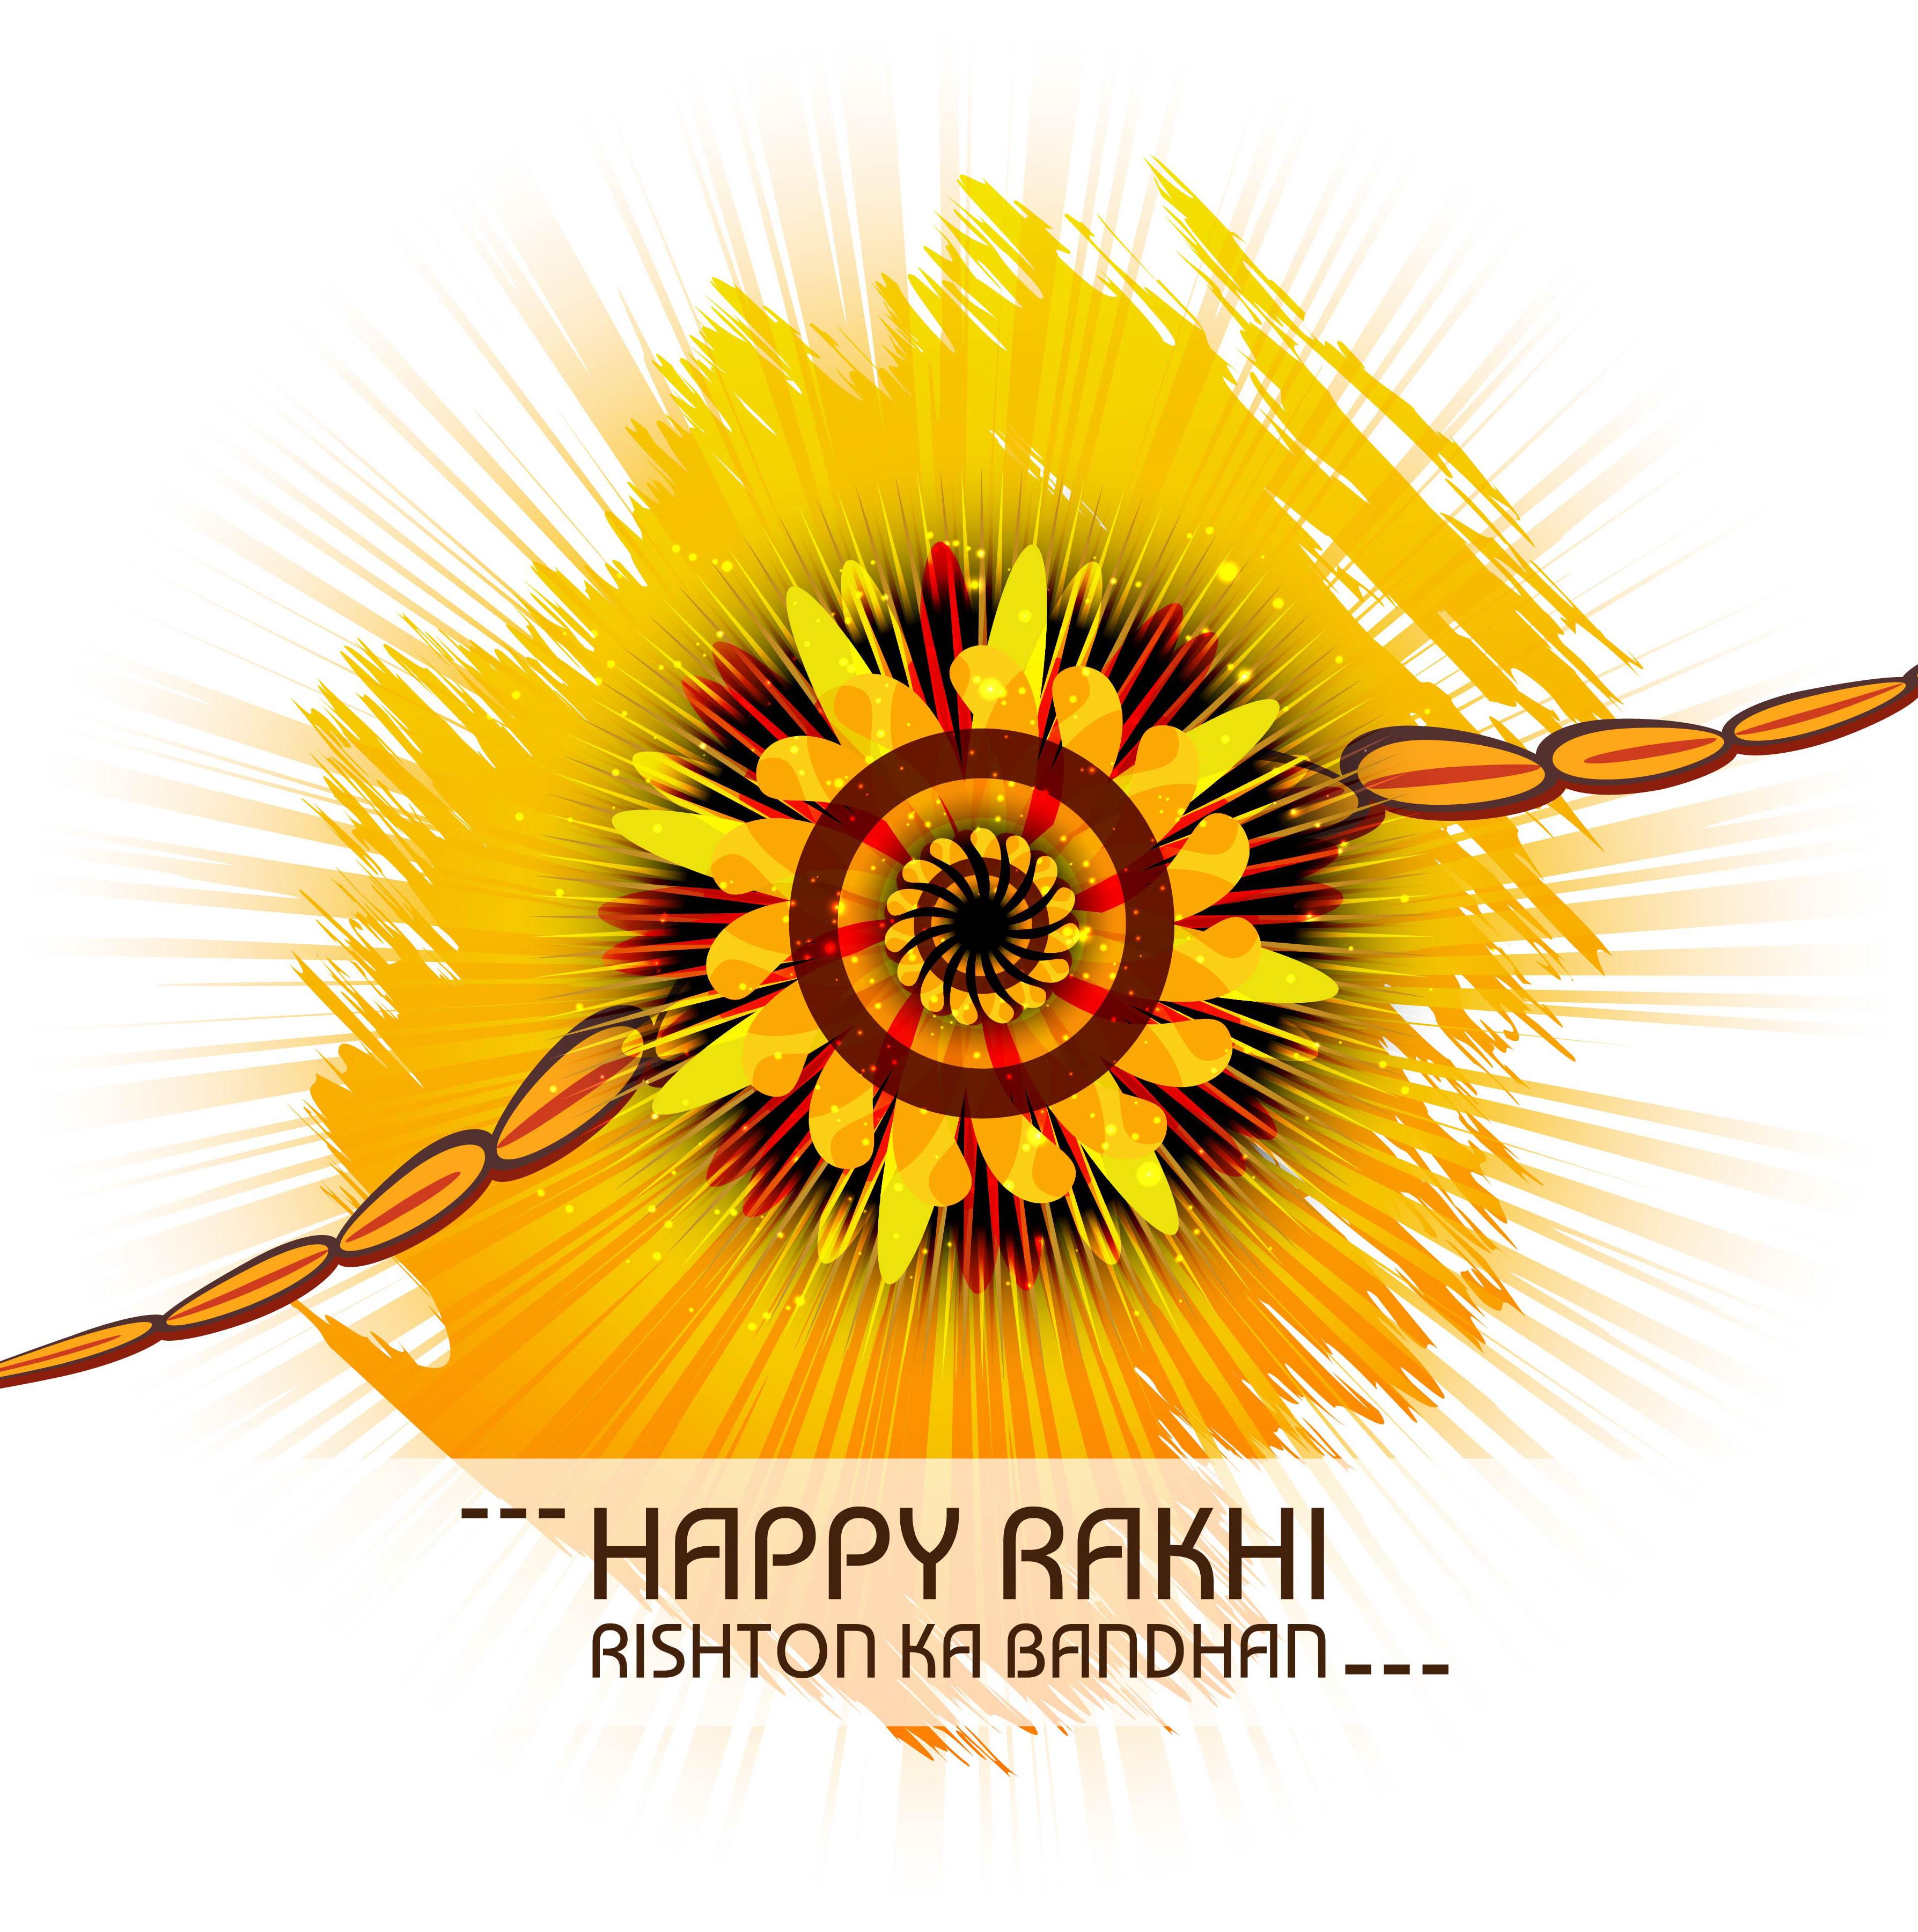 Greeting Card Design With Raksha Bandhan Colorful